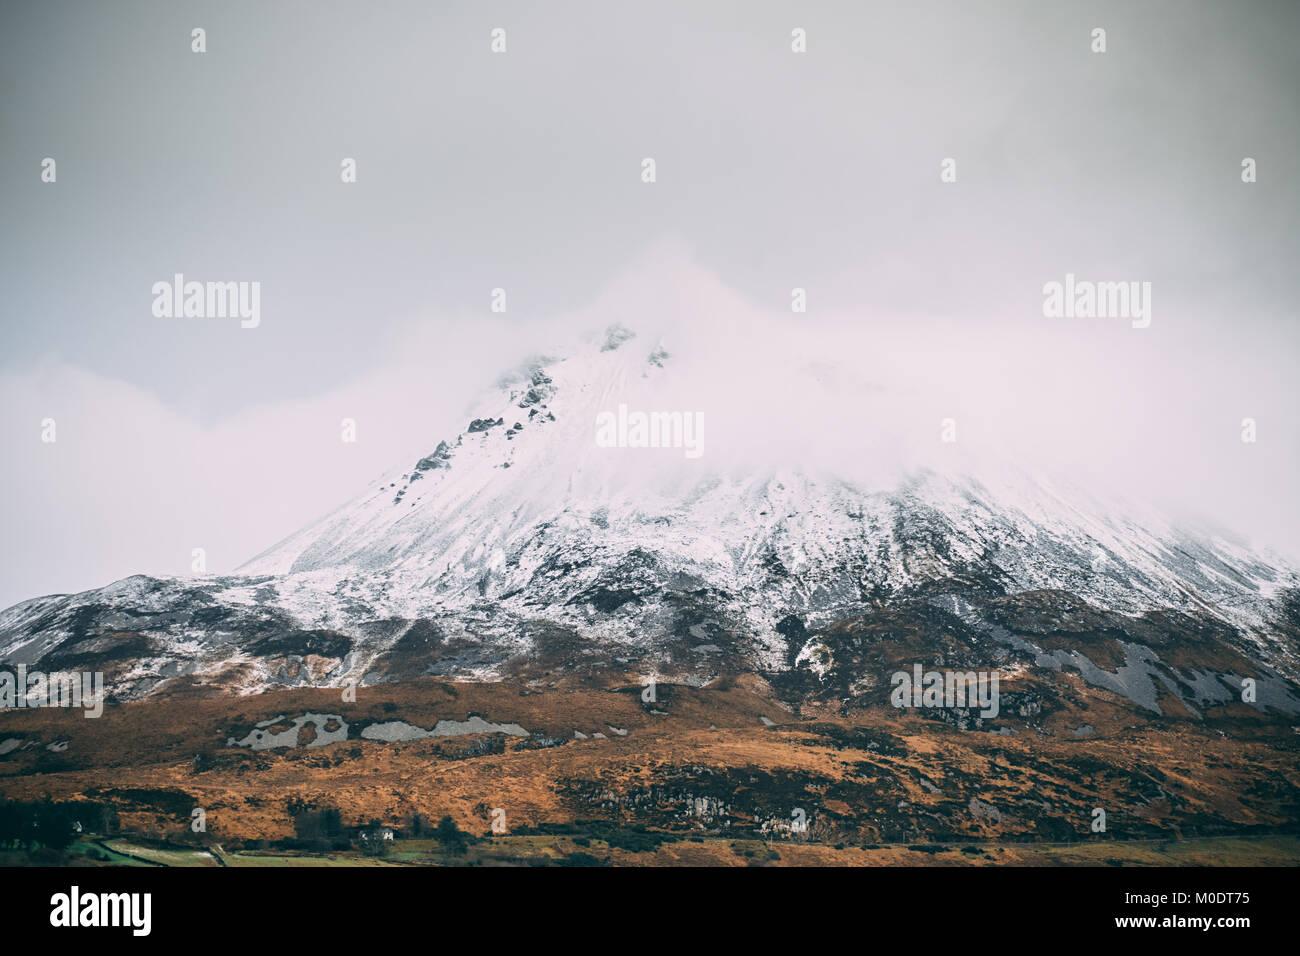 Mount Errigal in Donegal - Ireland - Stock Image